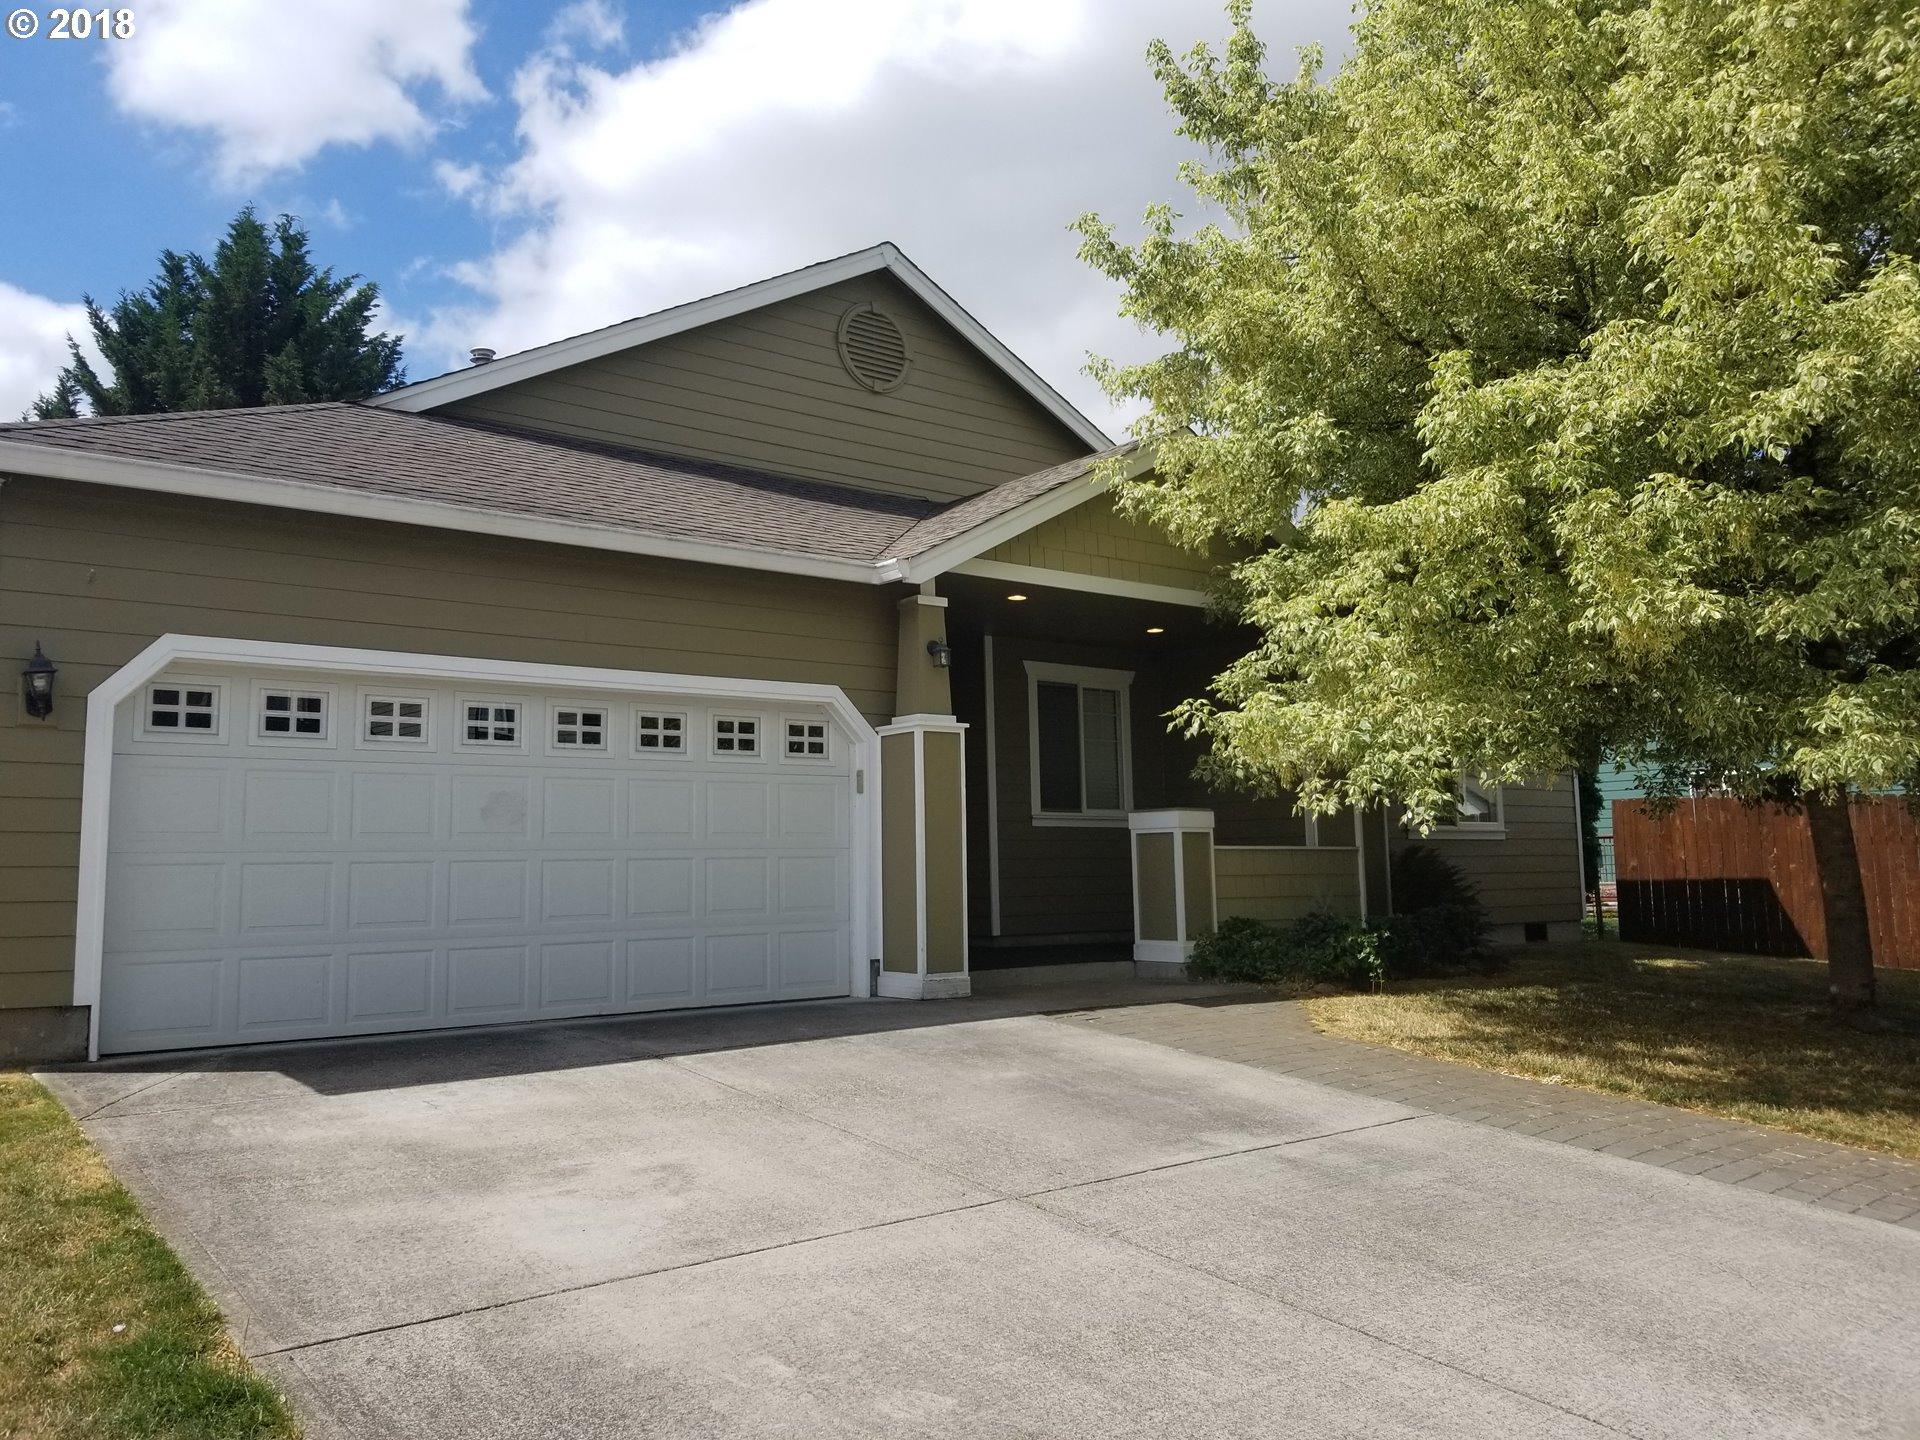 16307 NE 91ST ST Vancouver, WA 98682 - MLS #: 18643688